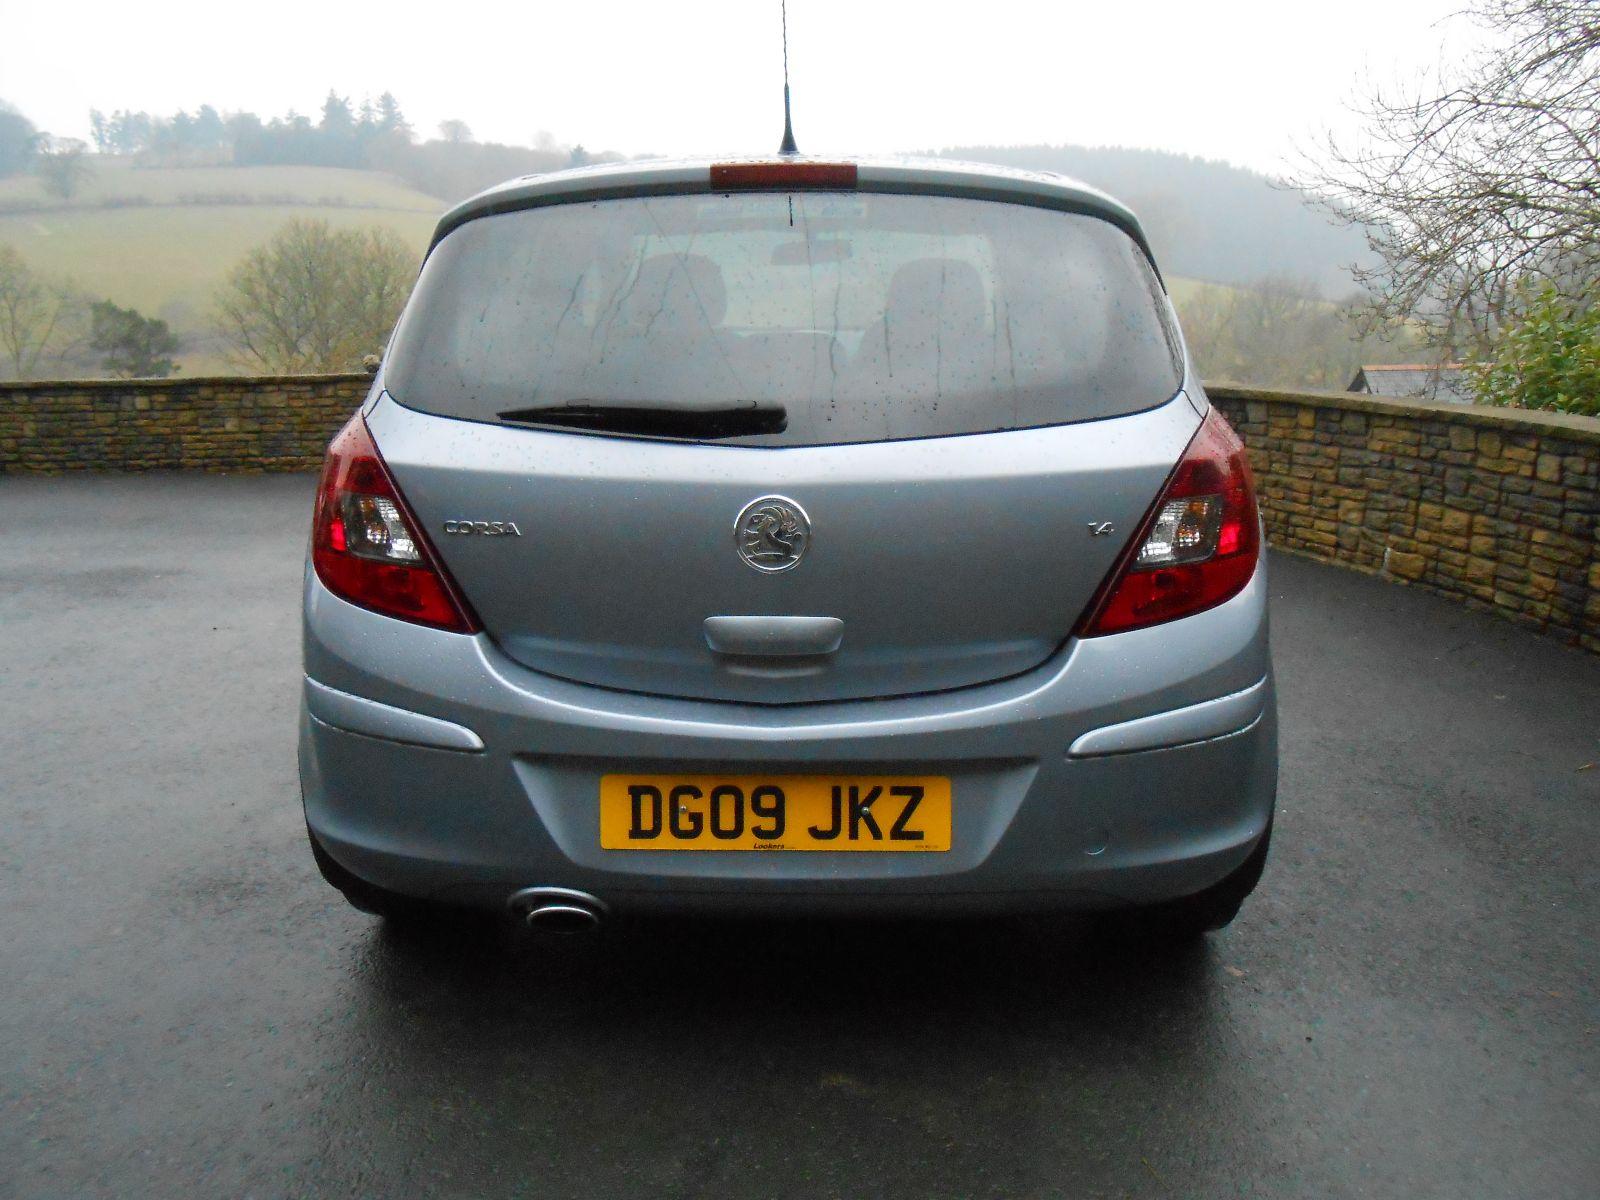 Vauxhall Corsa 1 4 Sxi Car For Sale Llanidloes Powys Mid